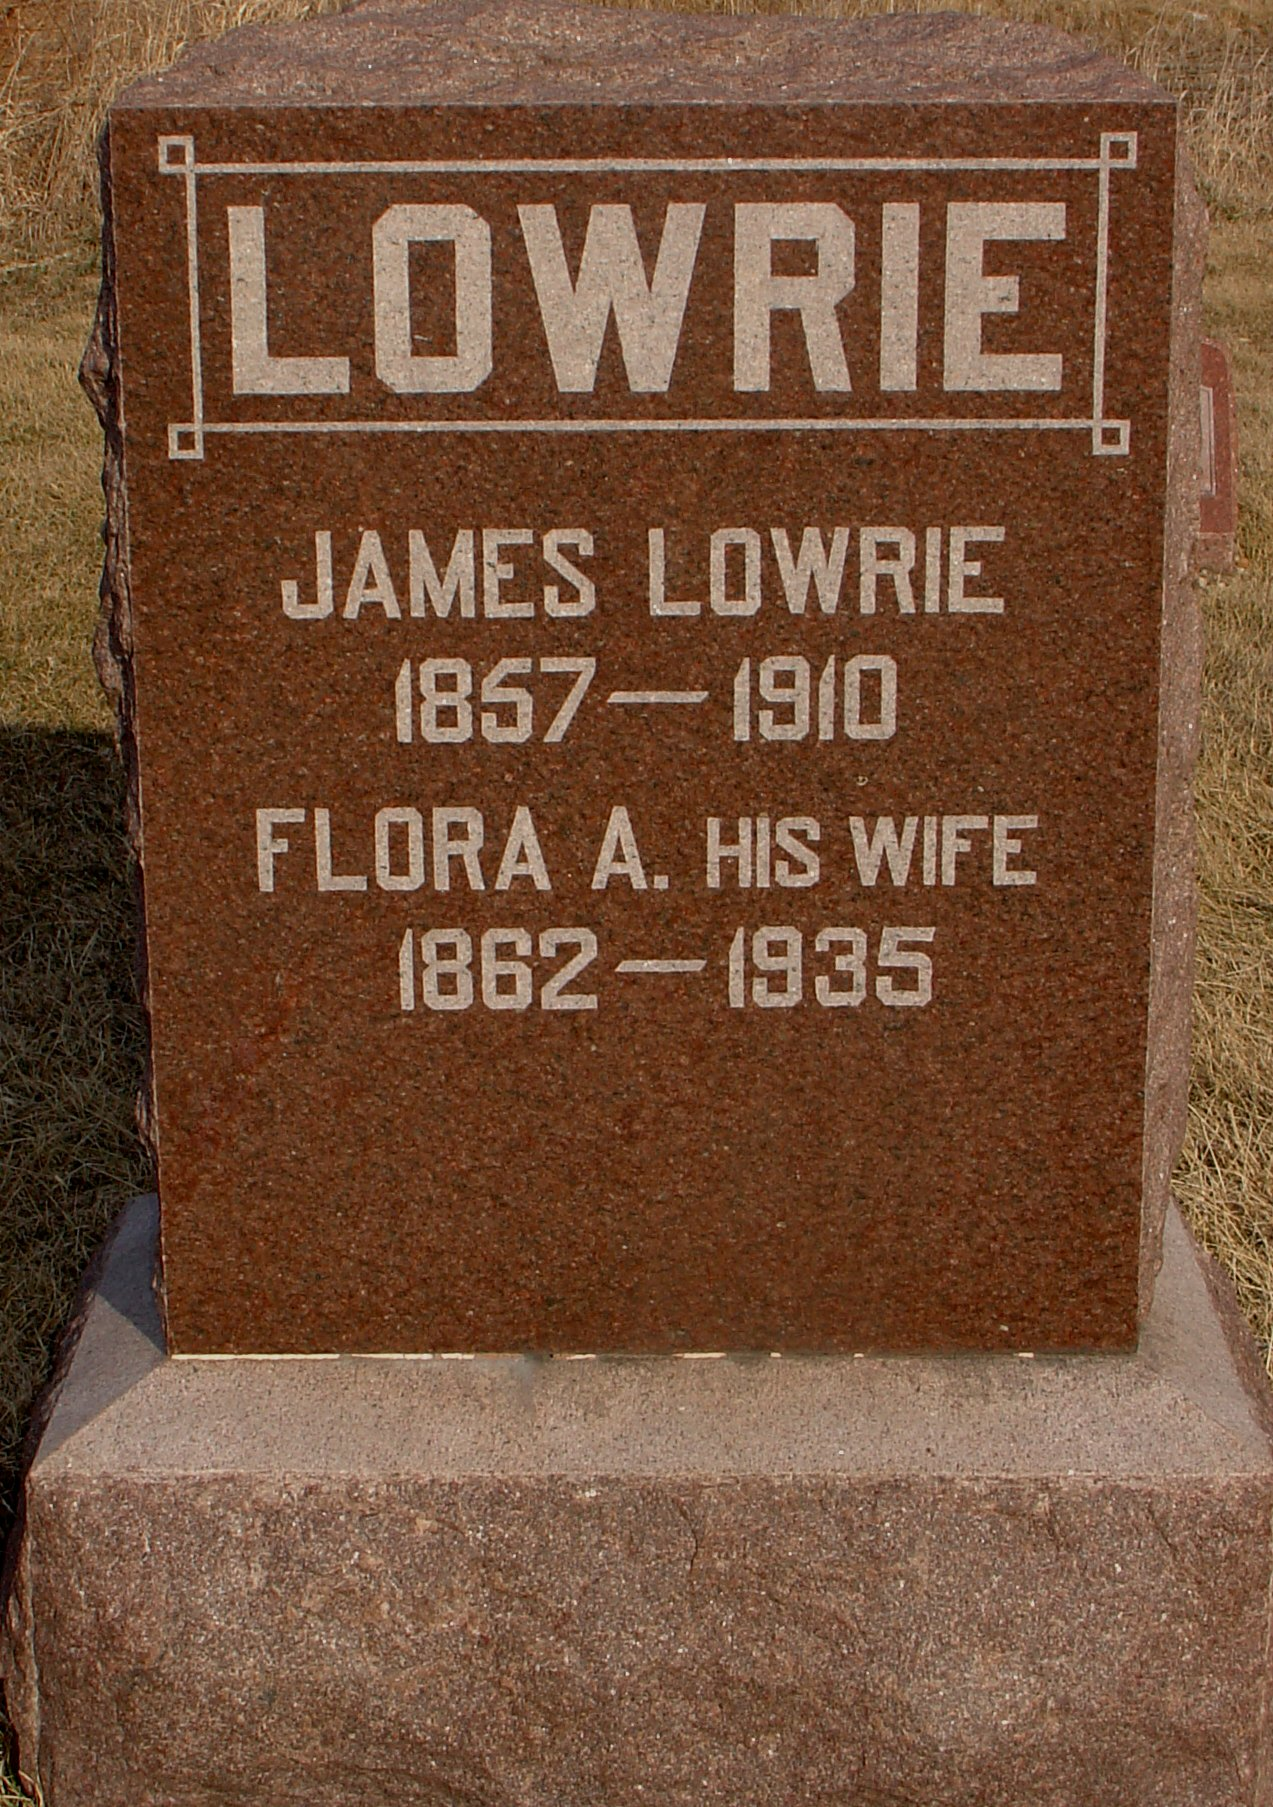 Flora A. Lowrie